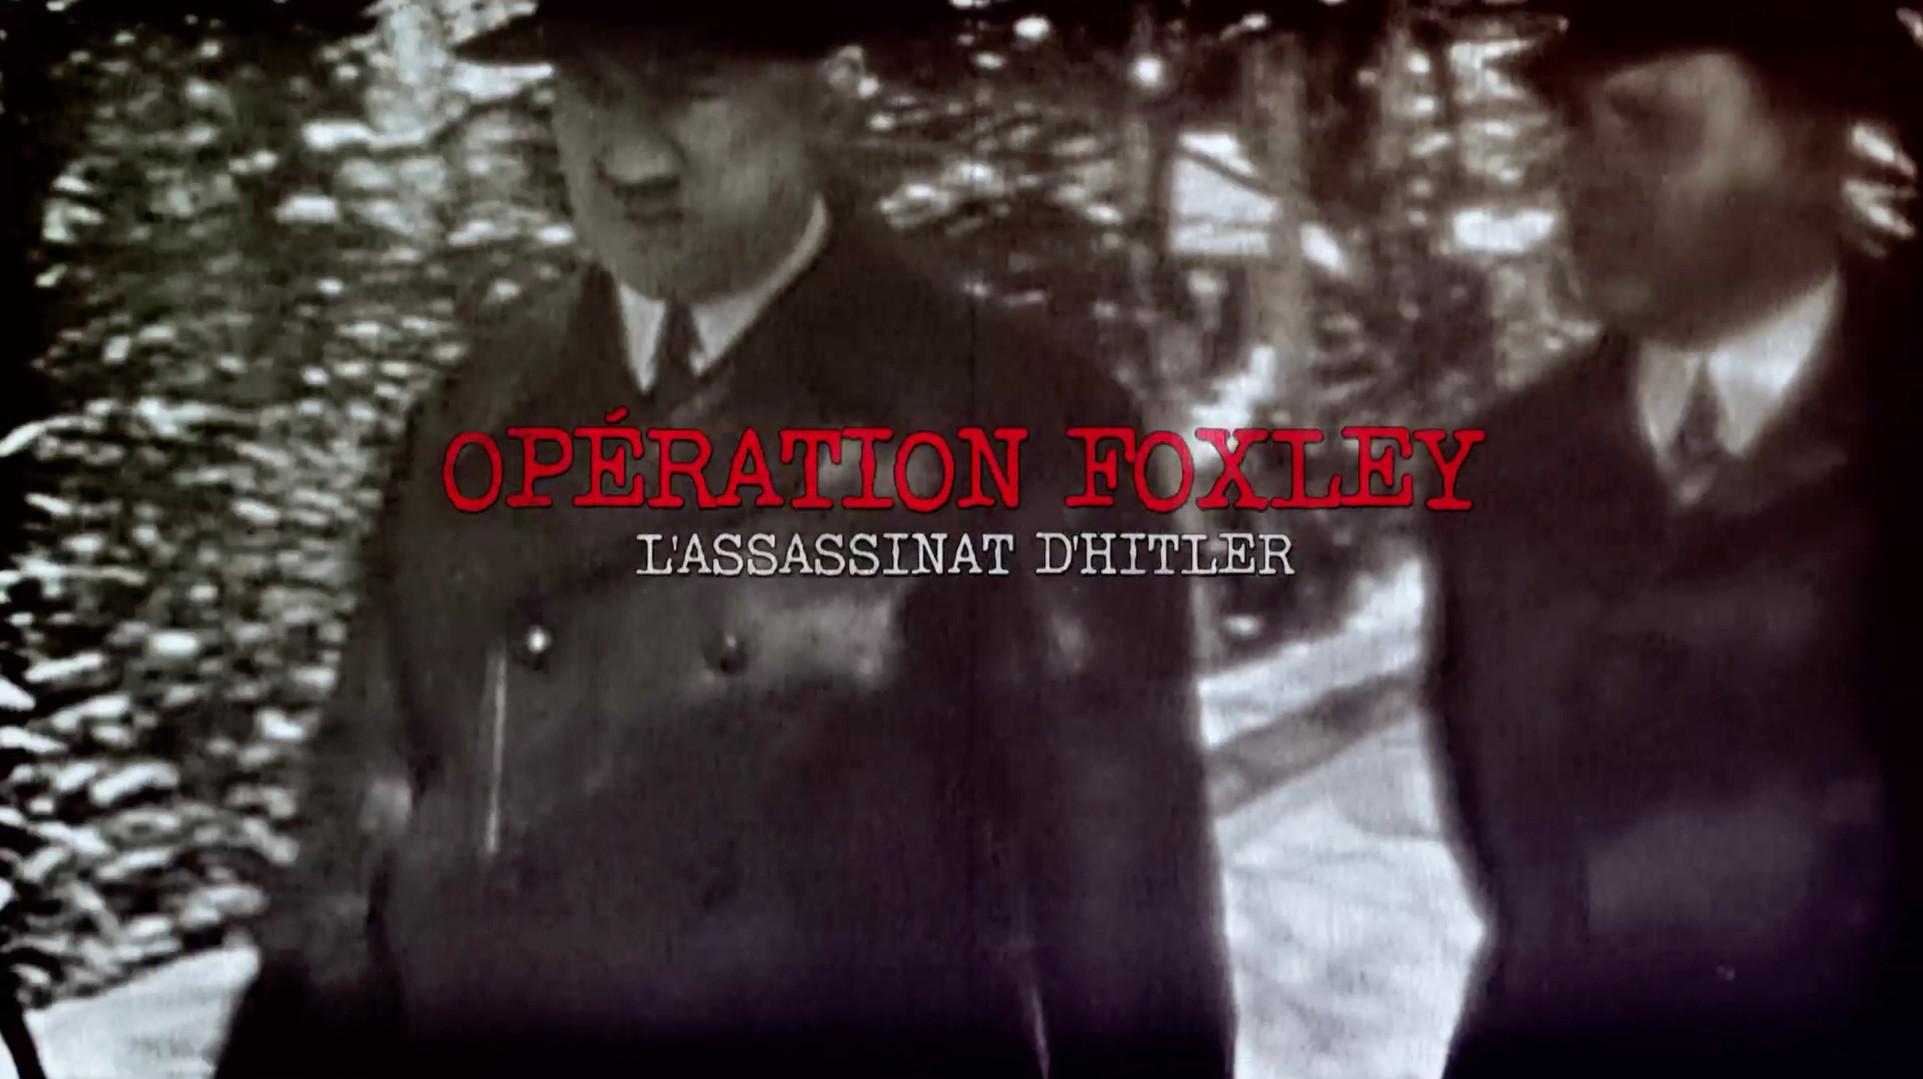 Opération Foxley : L'assassinat d'Hitler • 2016 (52 min)